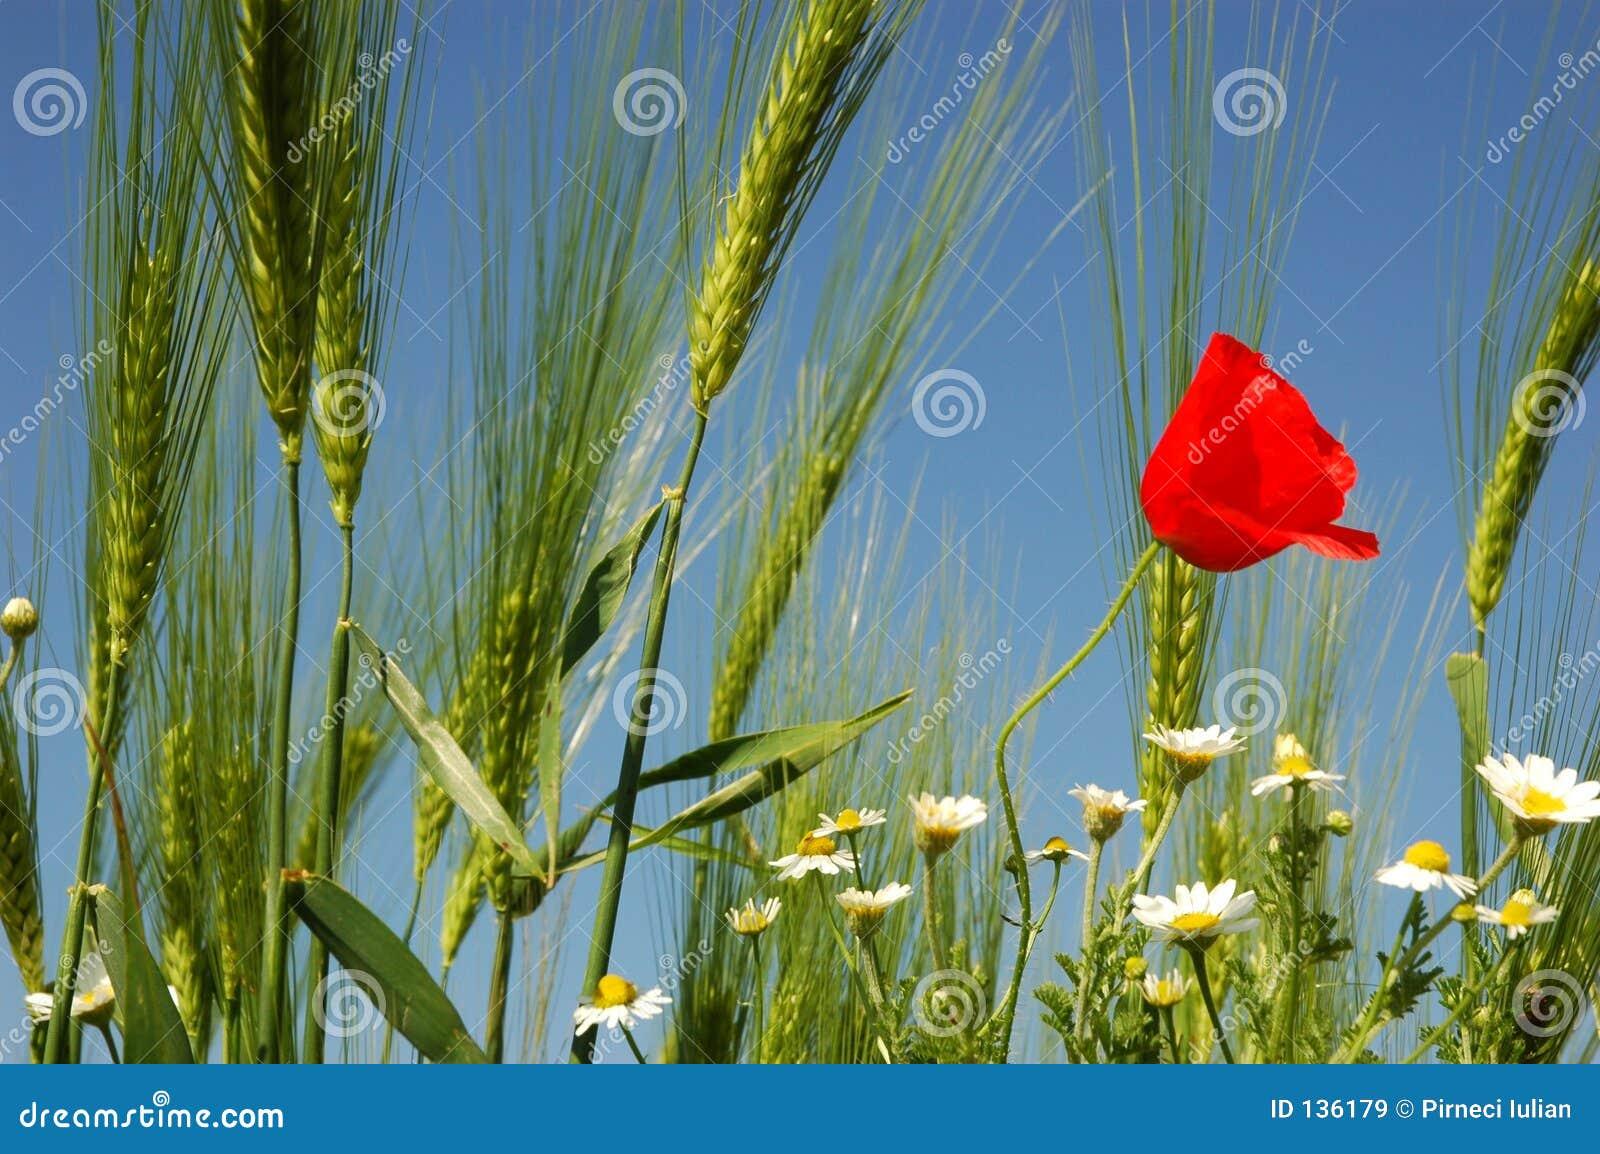 Wheat ok sky